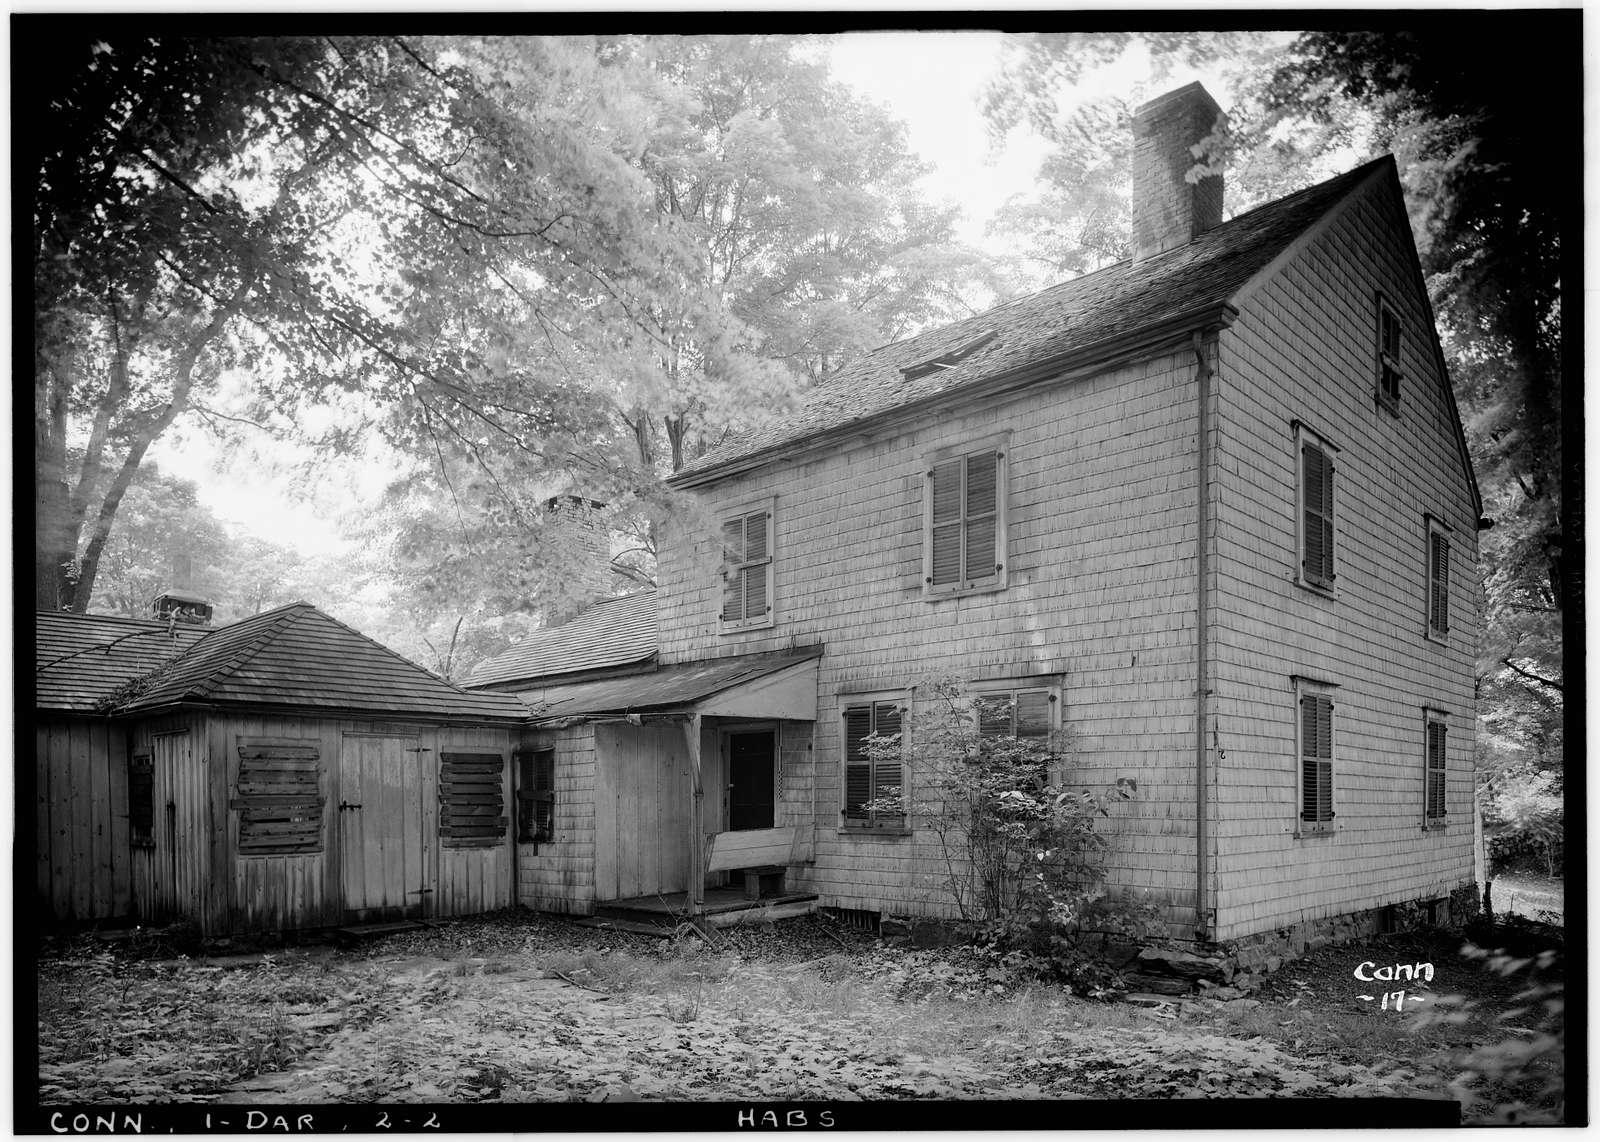 Clock-Turner House, 1830 Boston Post Road, Darien, Fairfield County, CT